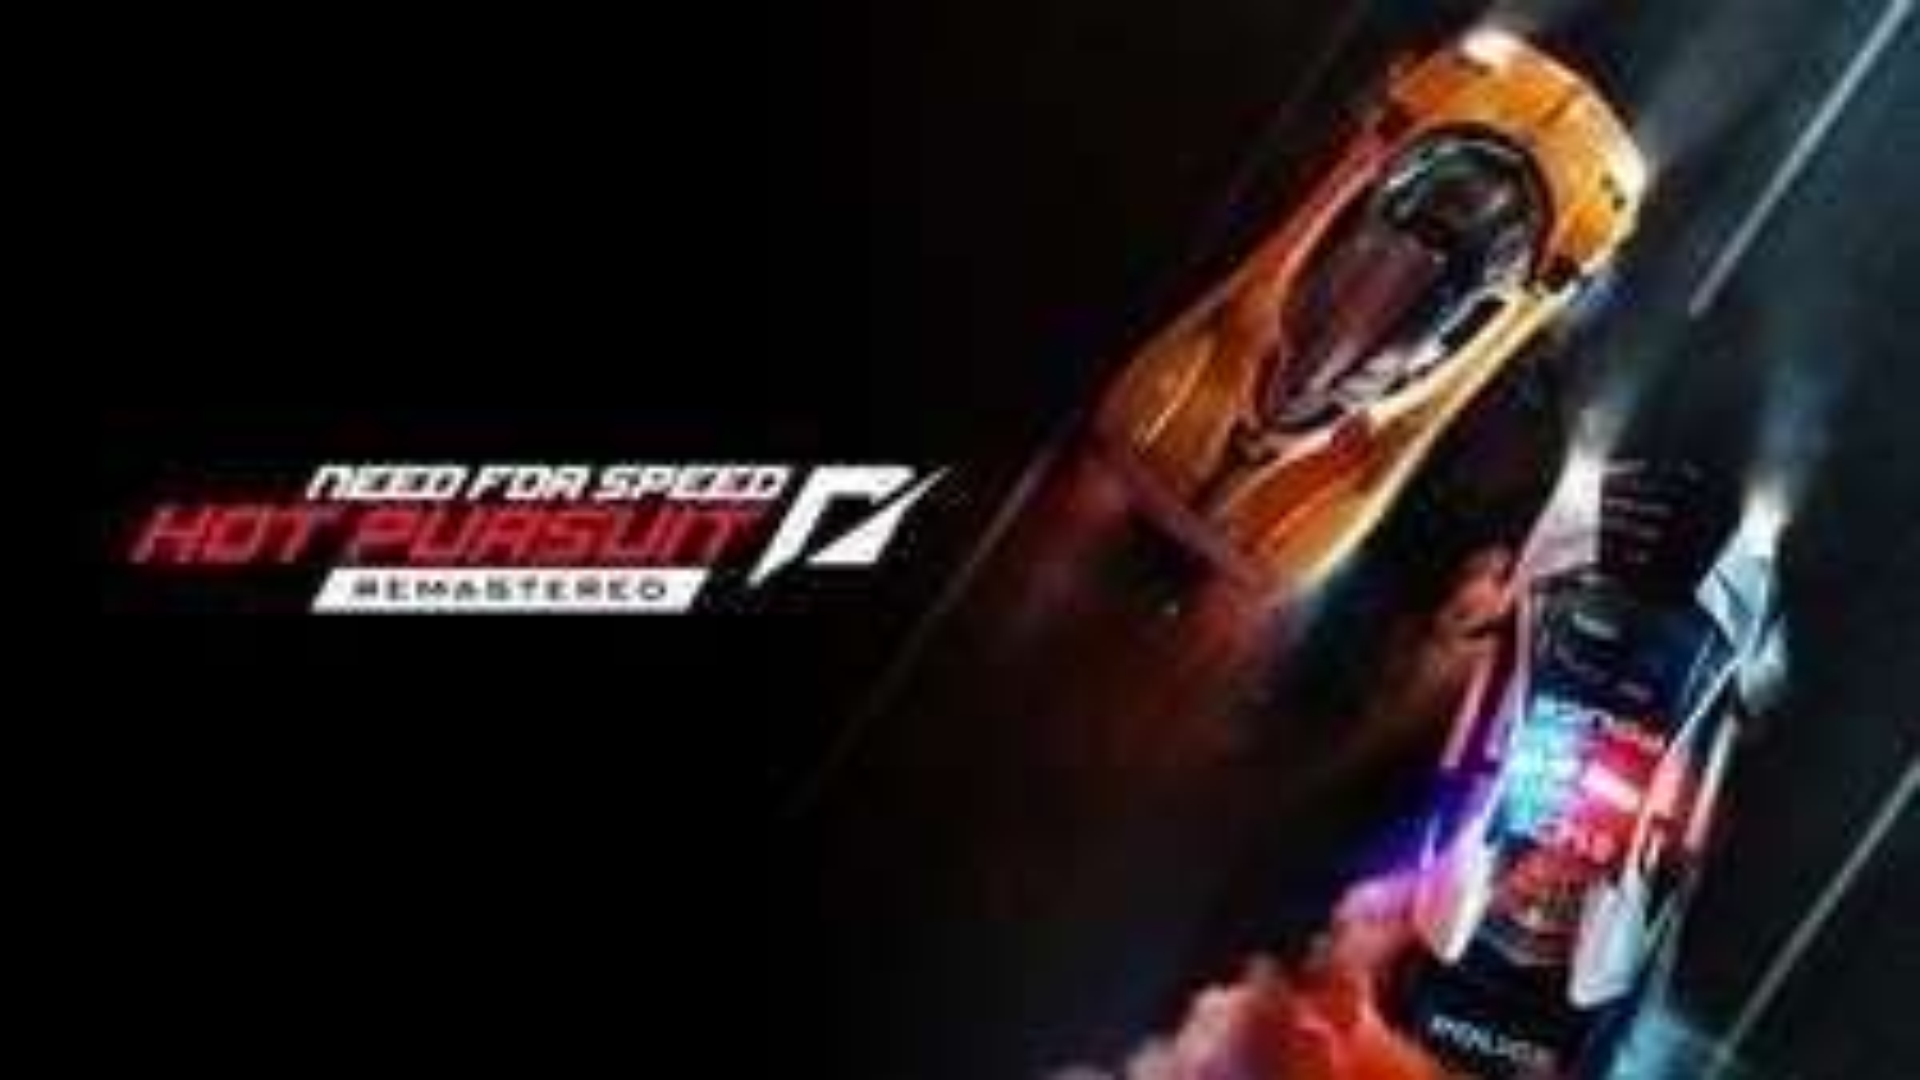 Nintendo Eshop USA: Need for Speed ™ Hot Pursuit Remastered